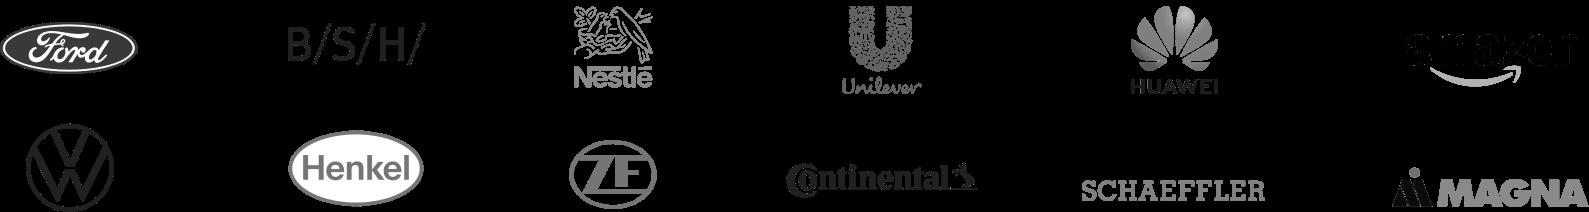 client logo overview